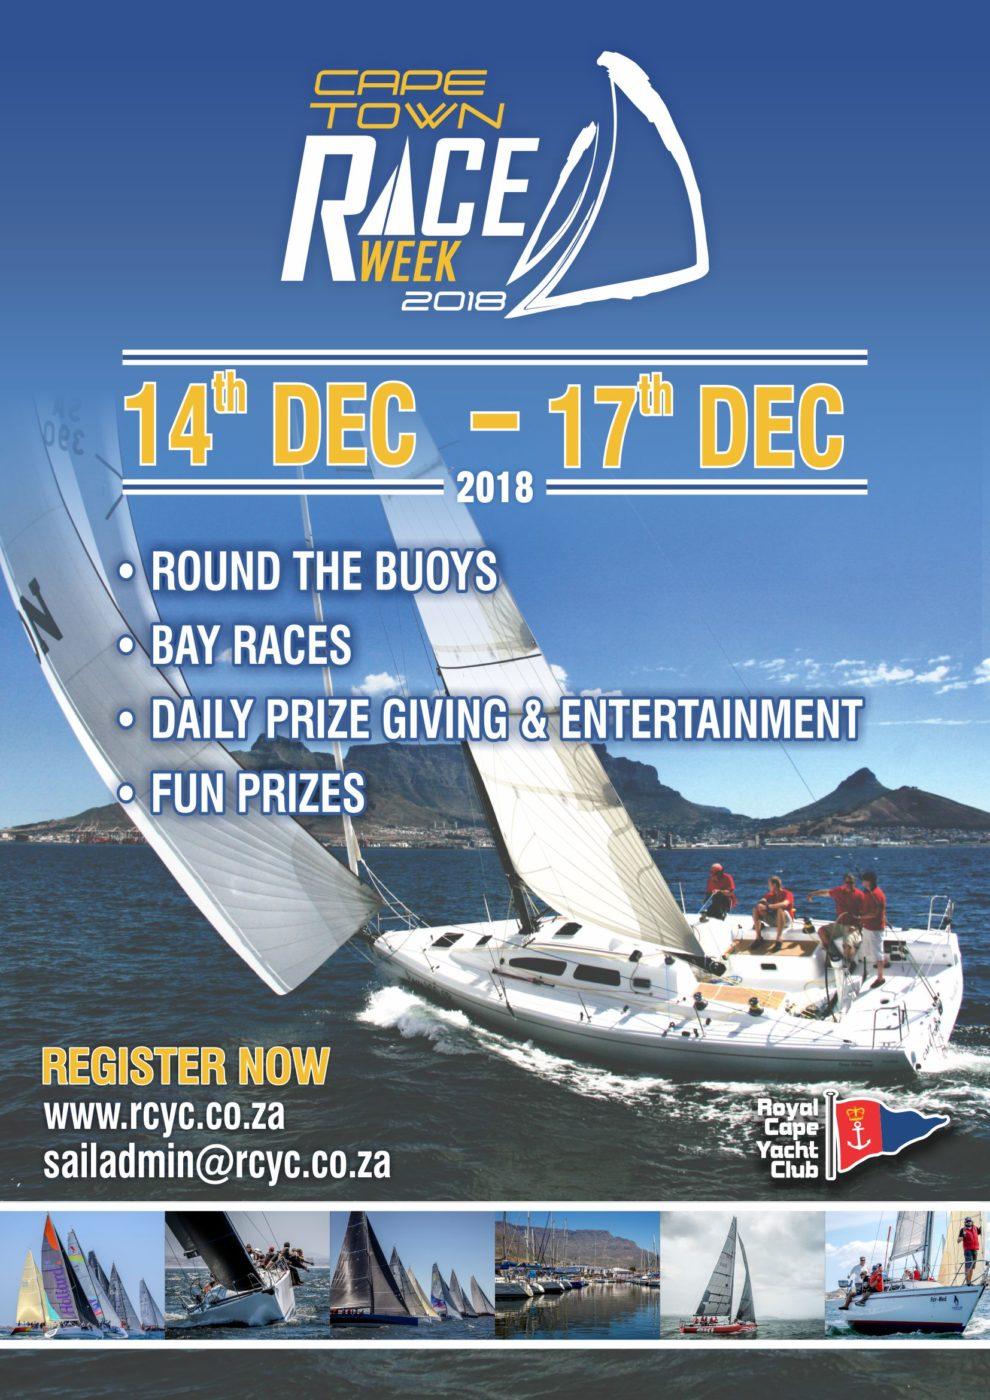 Cape Town Race Week 14th – 17th Dec 2018